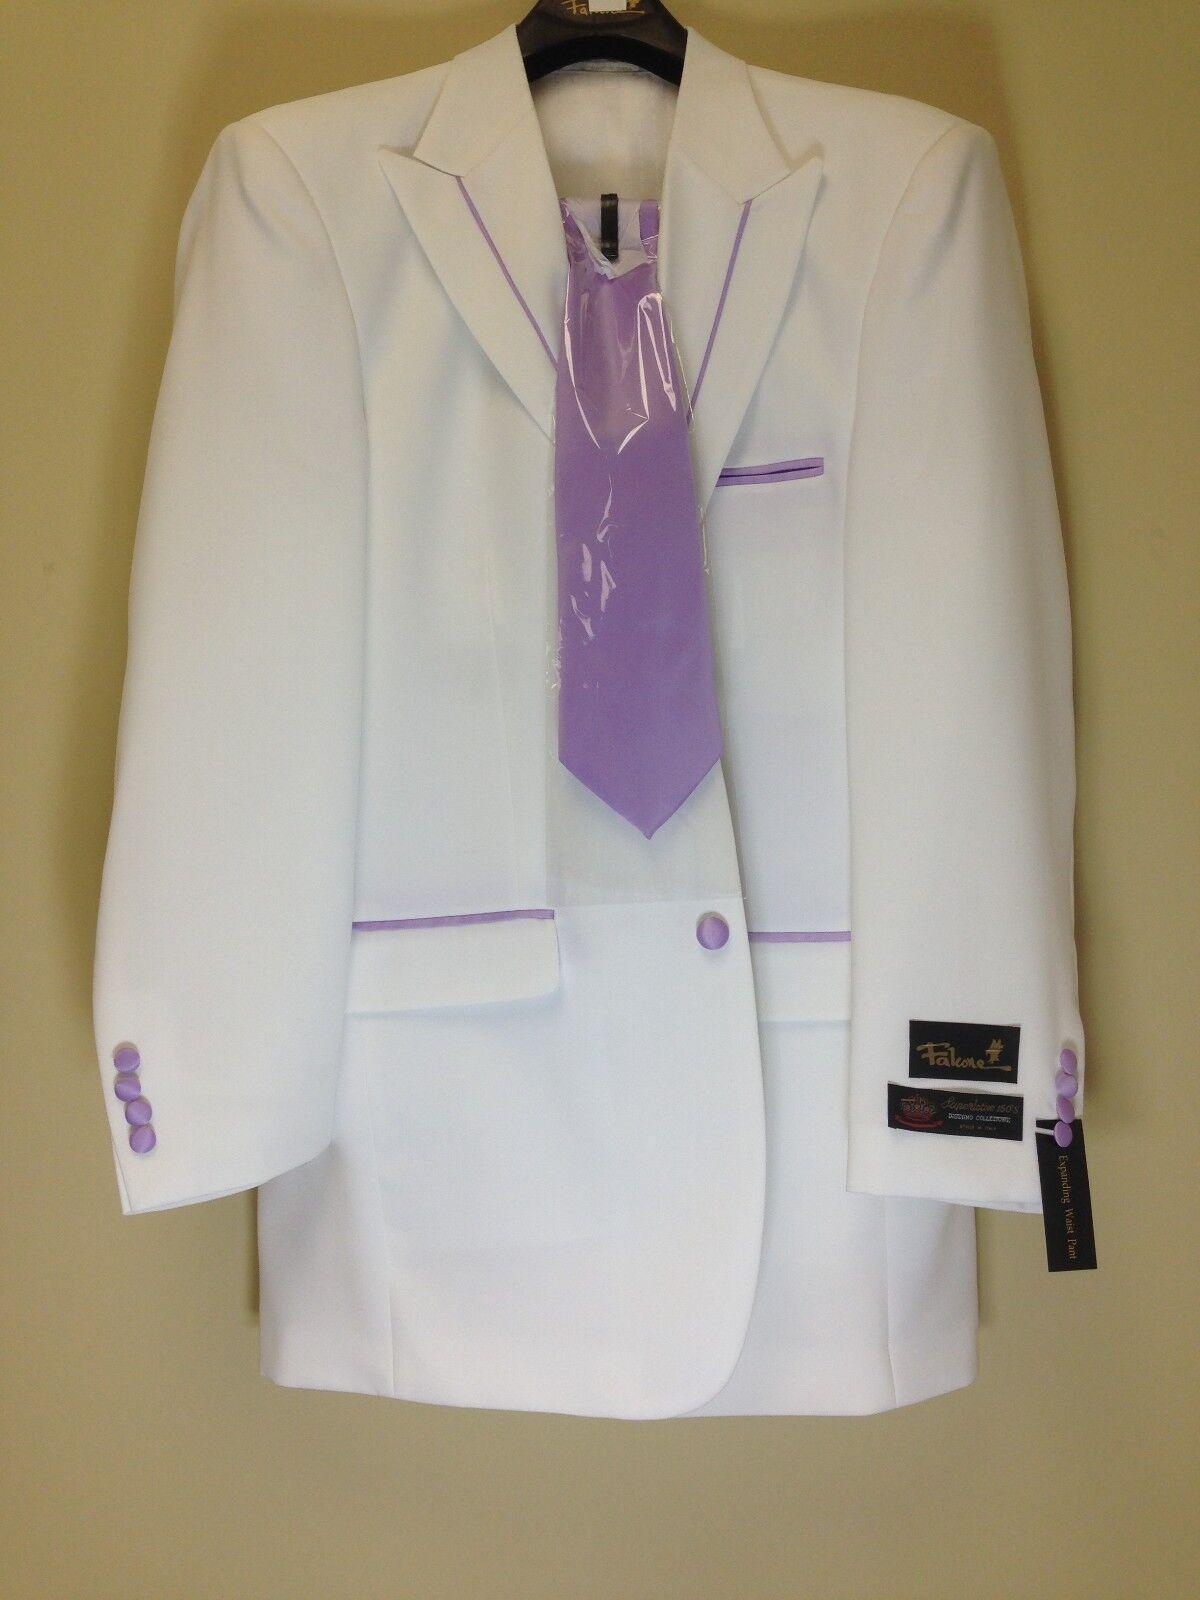 BNWT Falcone 48L Weiß Lavender Tuxedo Fashion Exotic Harvey Suit 4PC Solid Pant